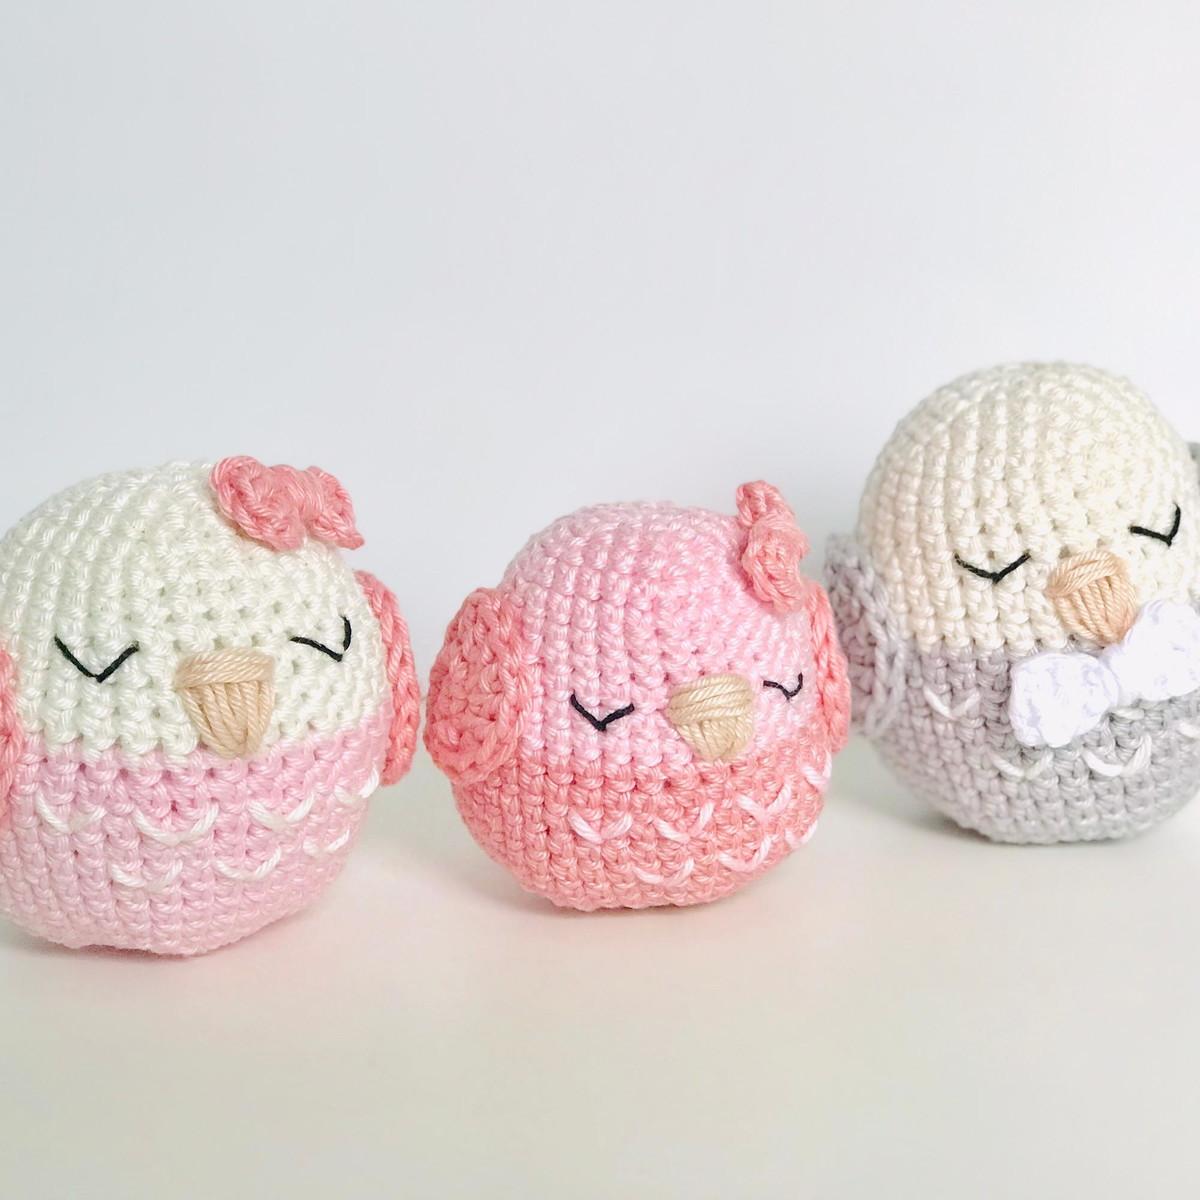 PEPPA PIG Amigurumi Pattern, Peppa Pig Patrón Amigurumi in 2020 ...   1200x1200